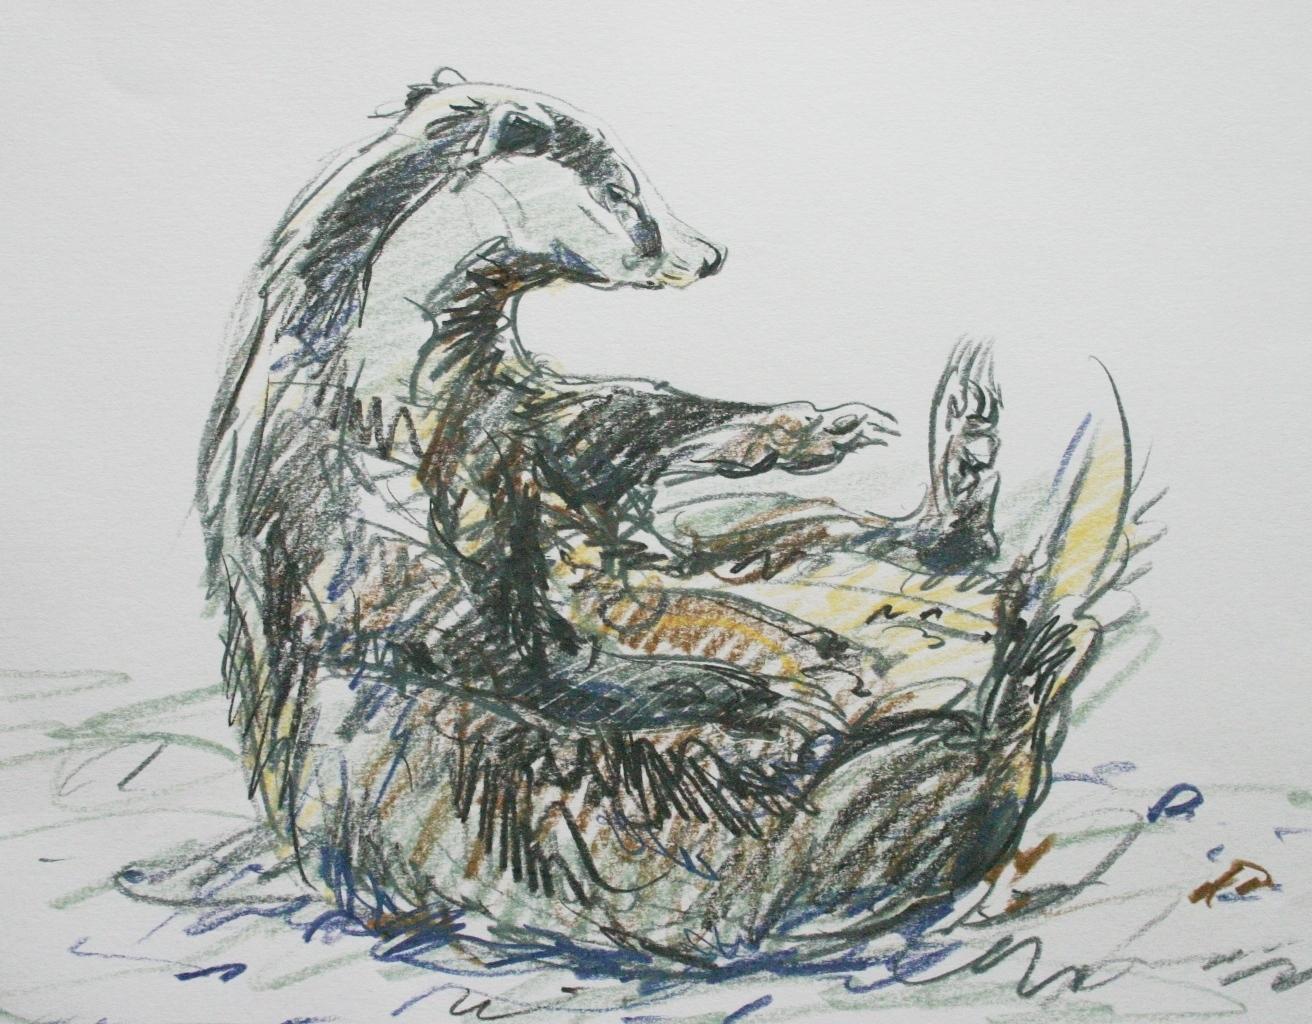 Badger scratch